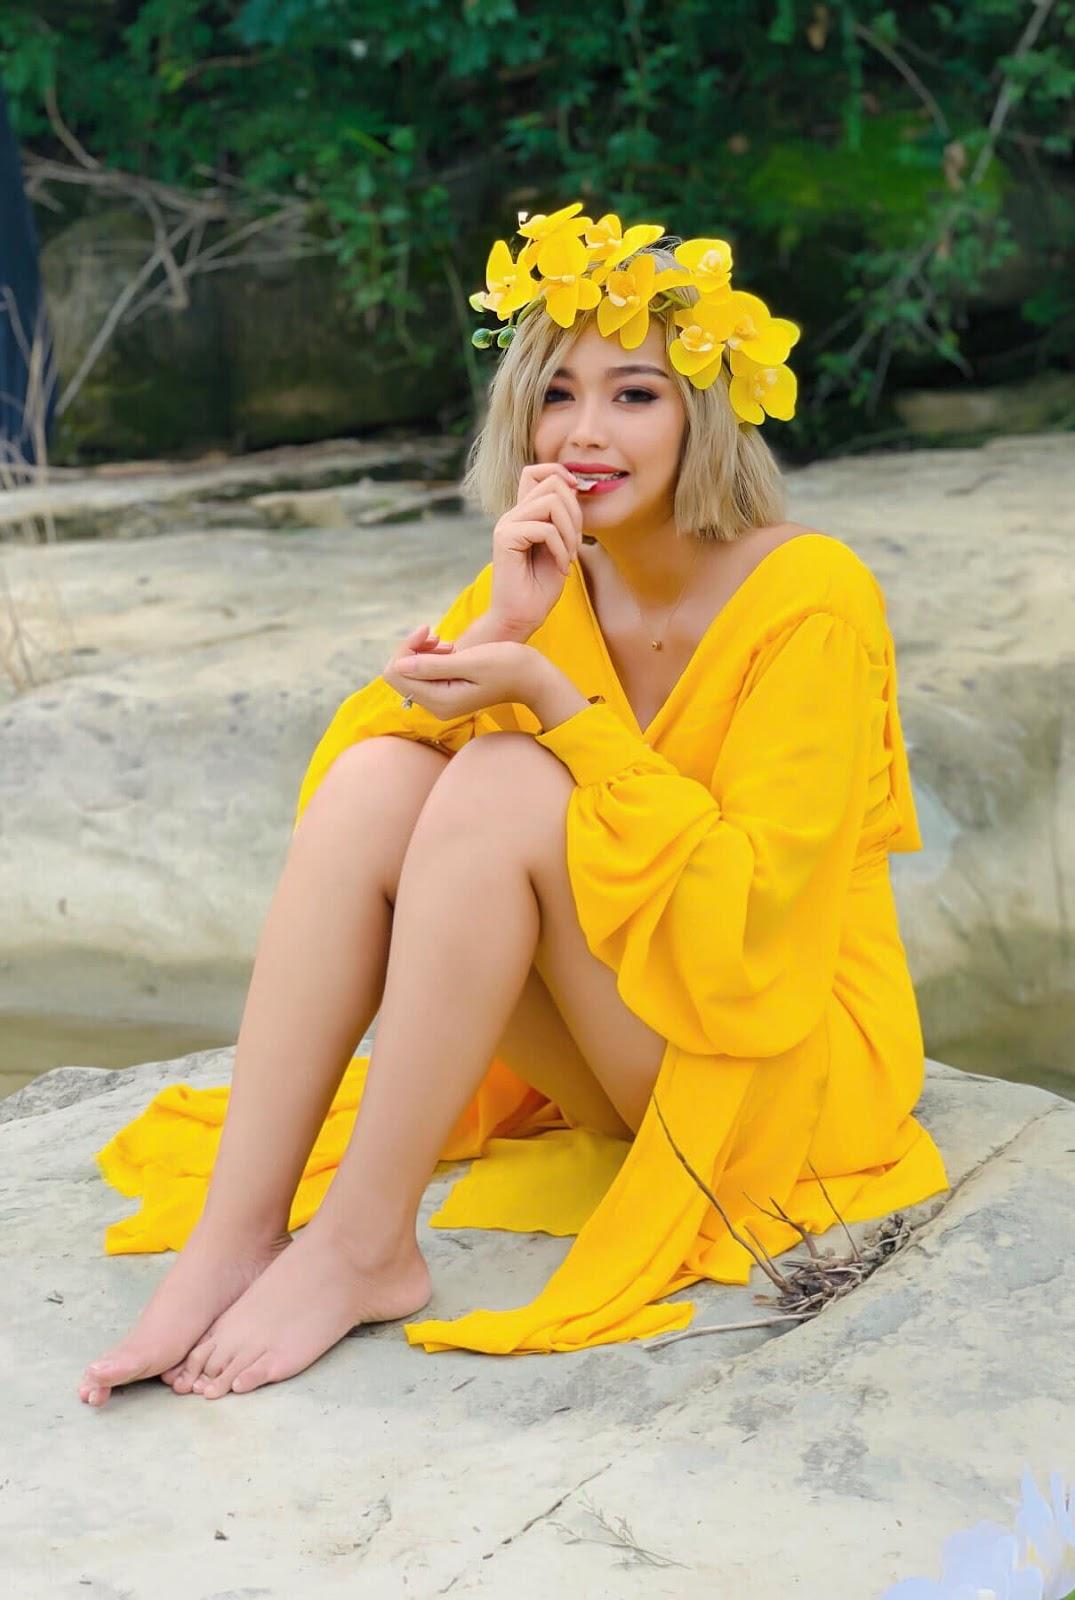 Nwe Nwe Tun - A Beautiful Girl With Yellow Dress Fashion